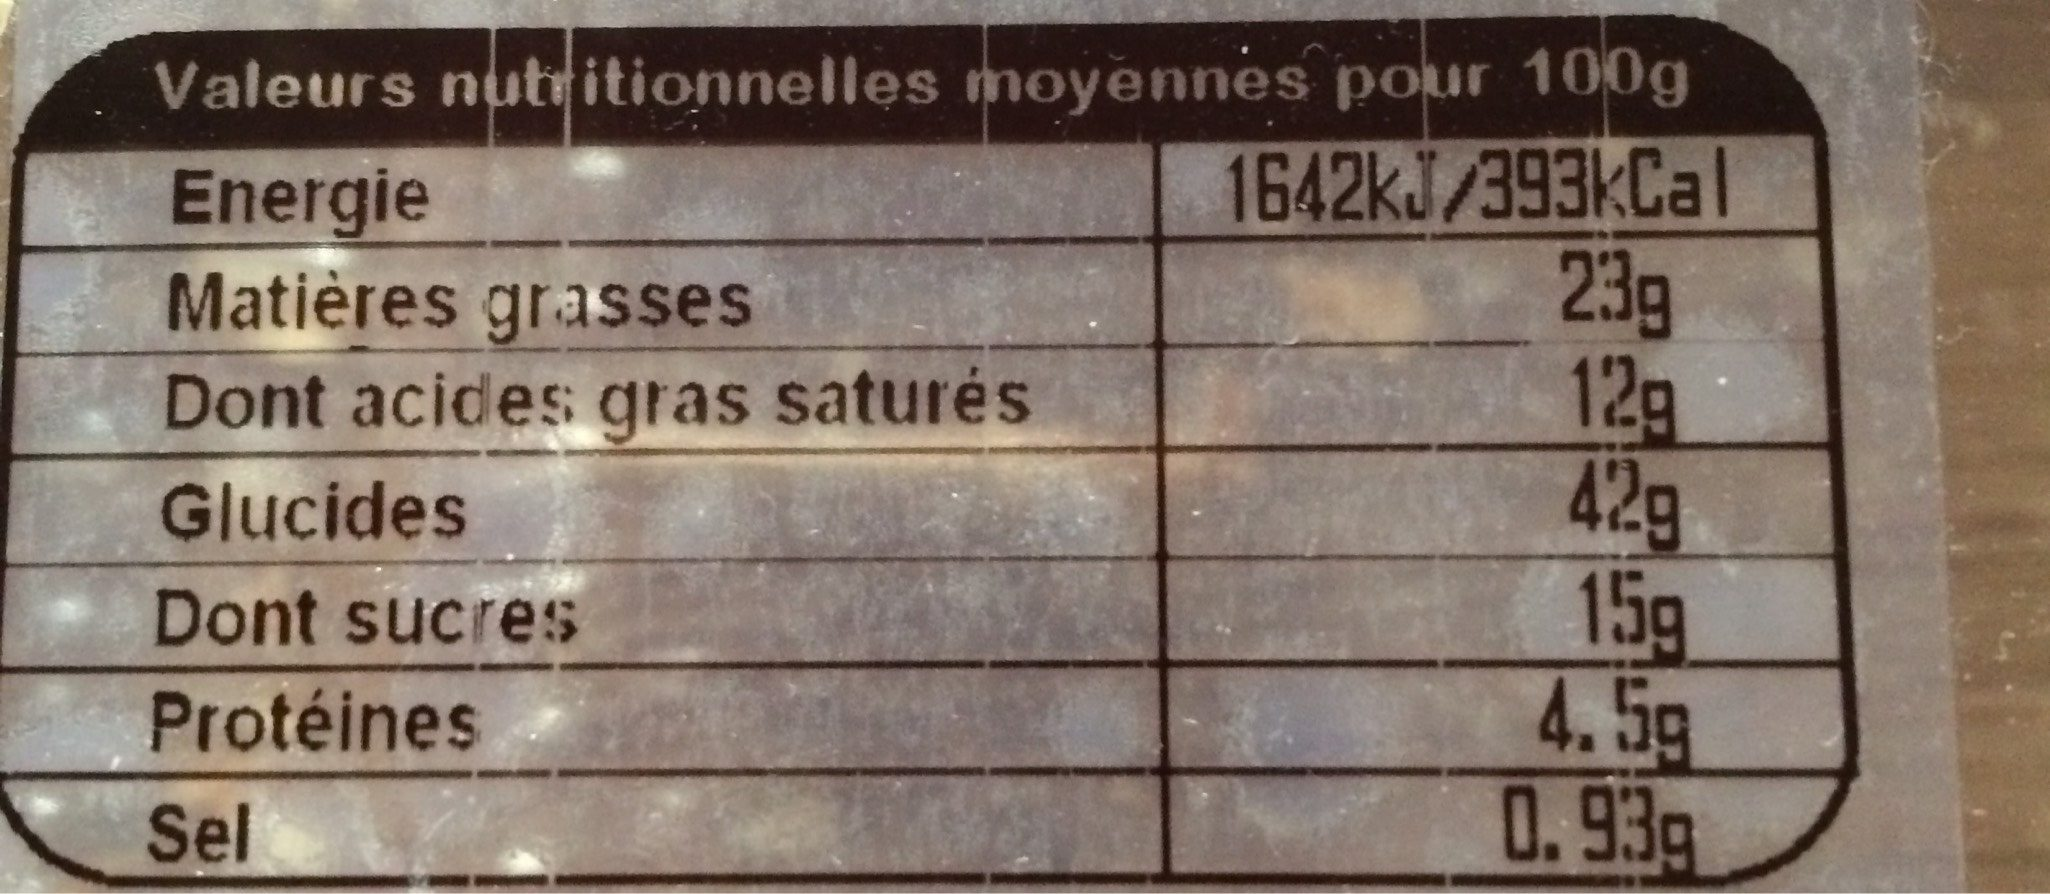 Palmiers - Voedingswaarden - fr